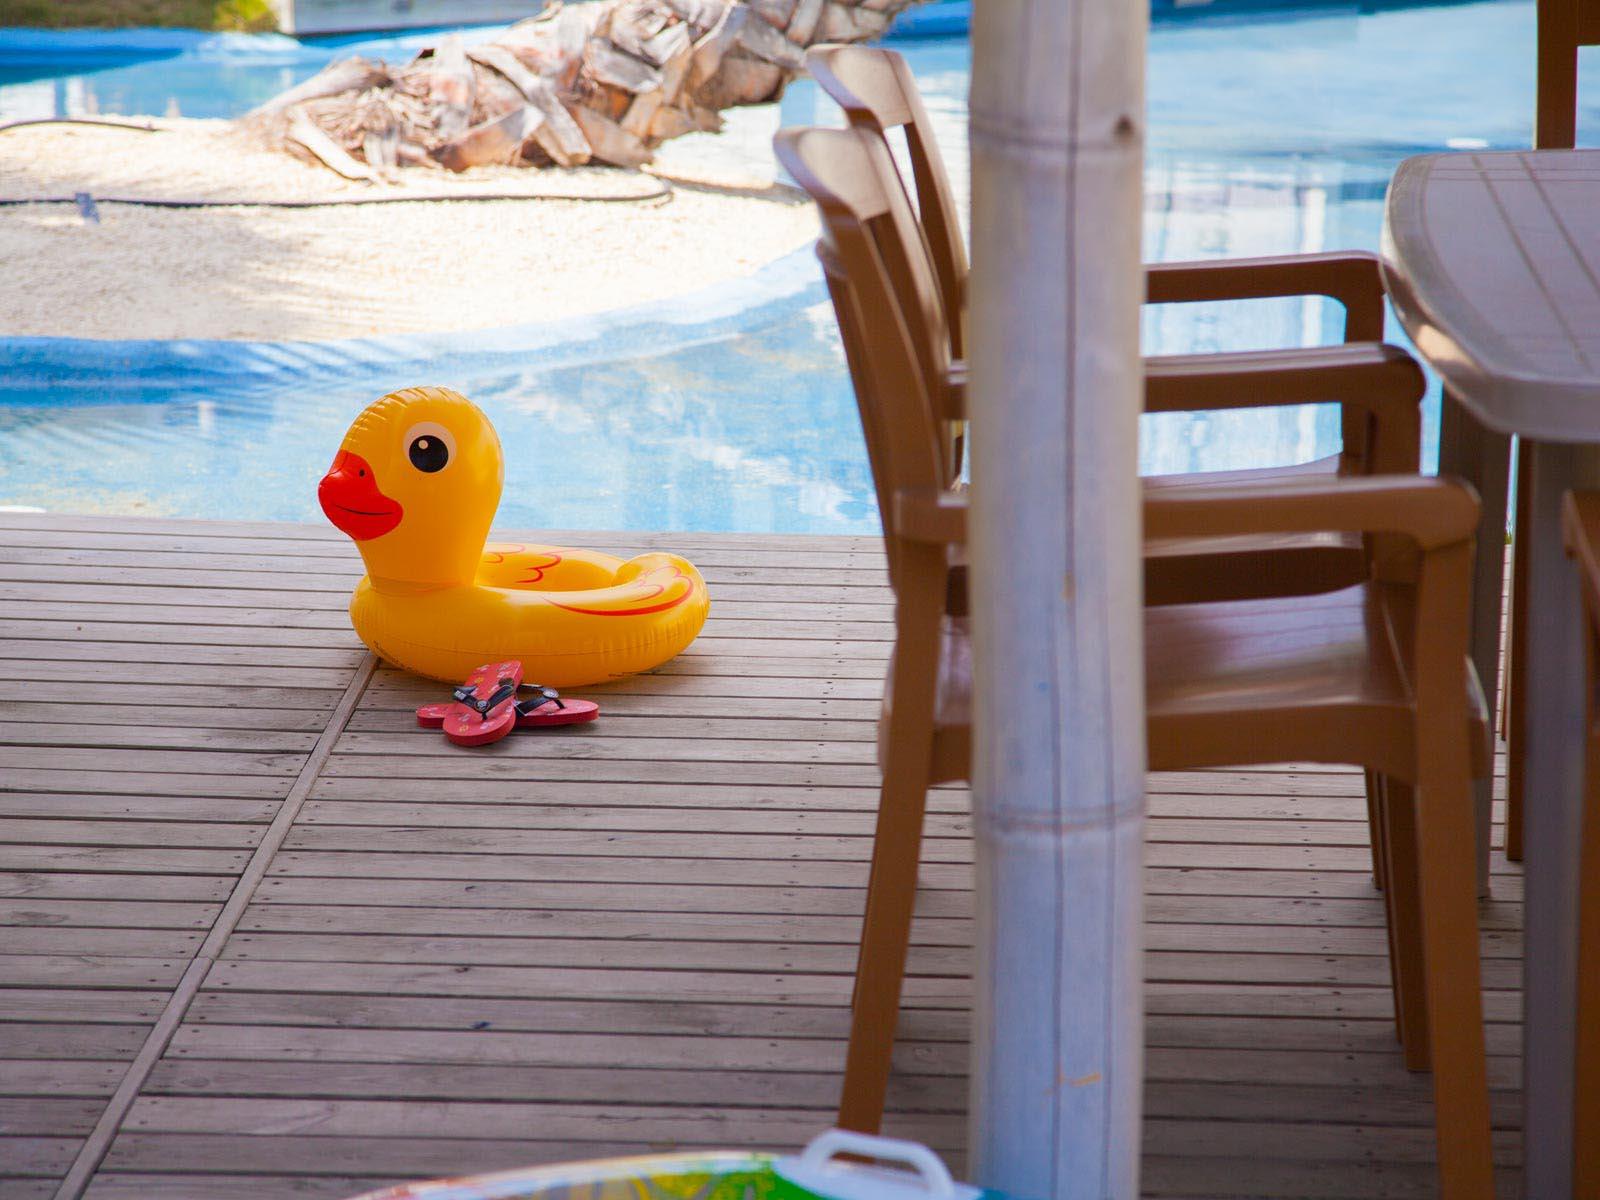 Canard jaune en plastique